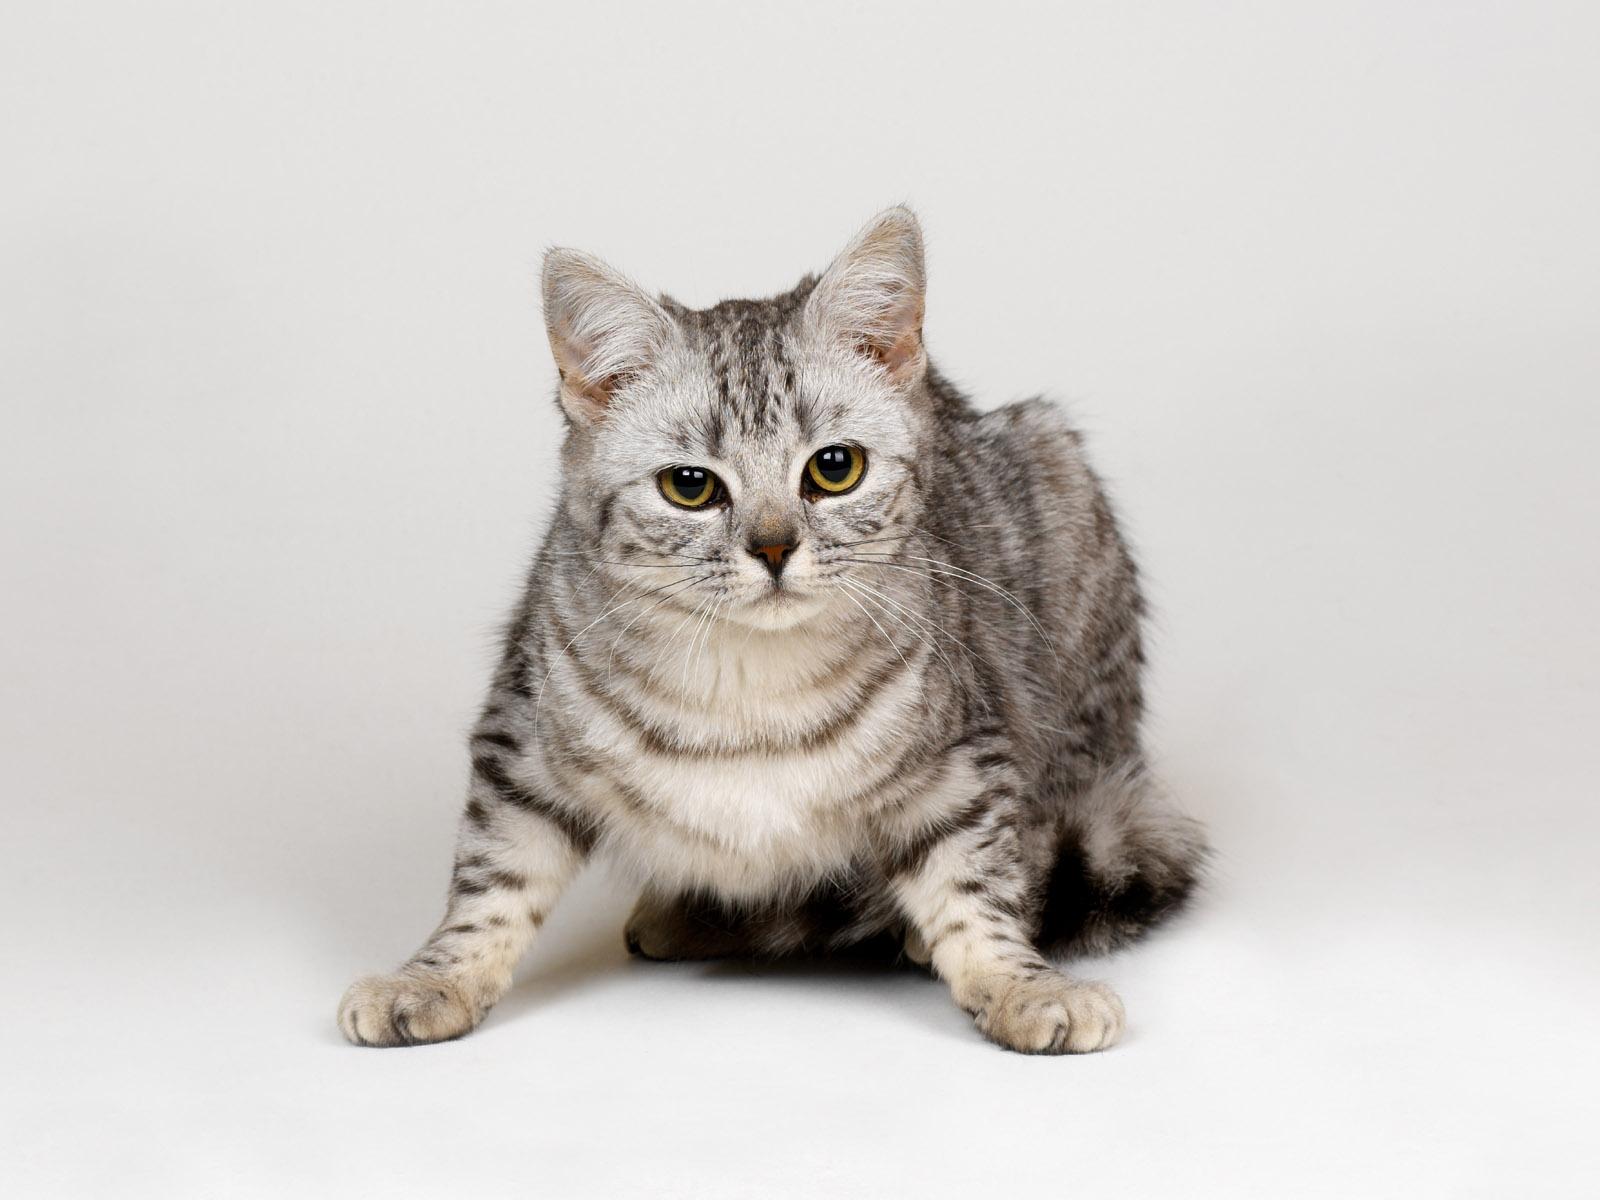 Wallpaper Asian Grey Fur Whiskers British Shorthair Kitten Fauna Strips Cat Like Mammal Snout Small To Medium Sized Cats Carnivoran Tabby Cat Domestic Short Haired Cat European Shorthair Pixie Bob American